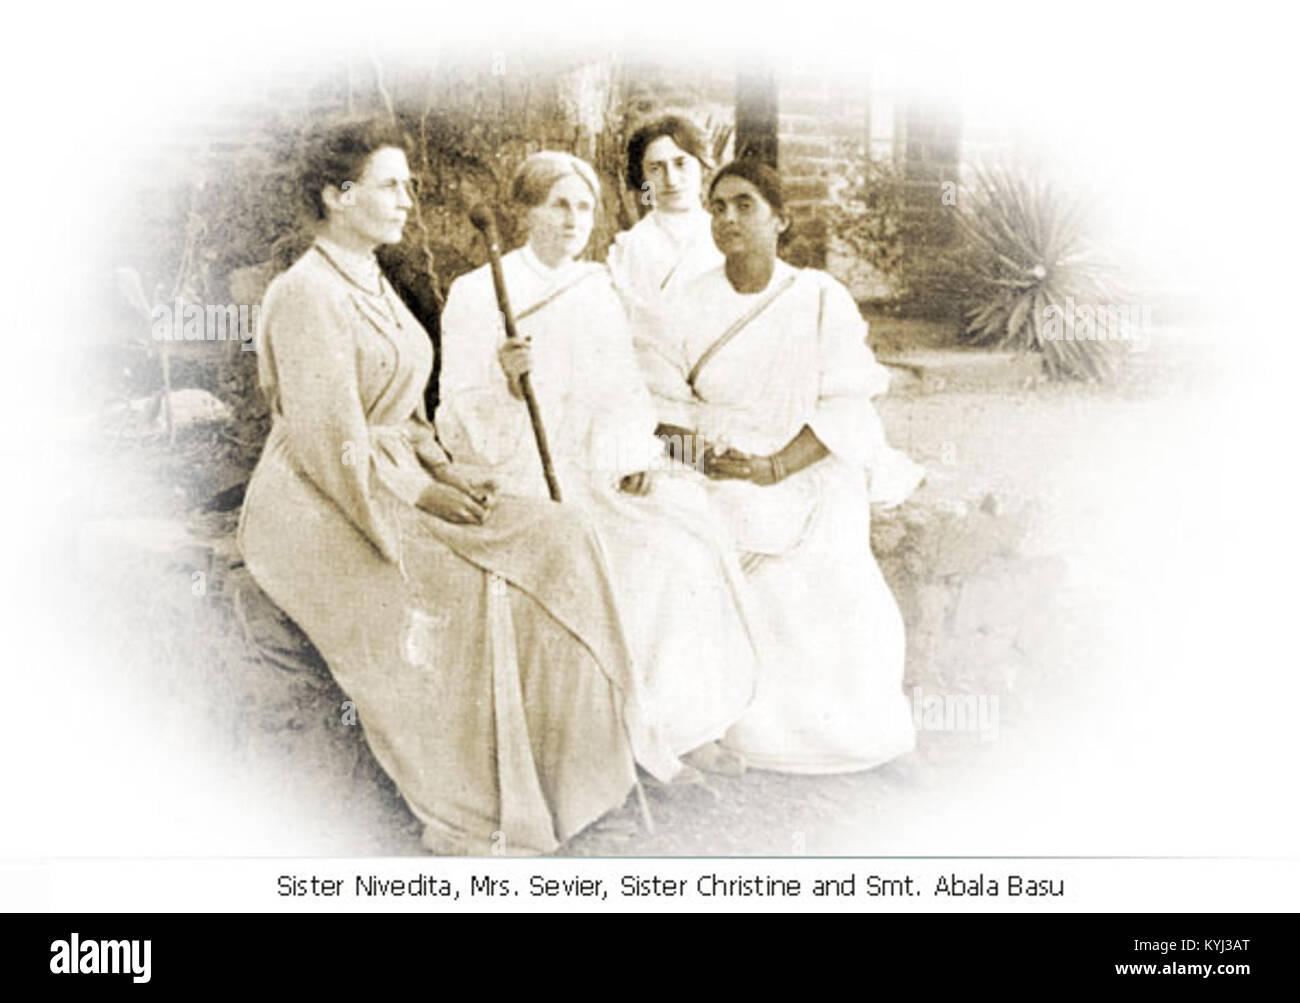 Sister Nivedita, Charlotte Sevier, Sister Christine and Lady Abala Bose in Mayavati - Stock Image